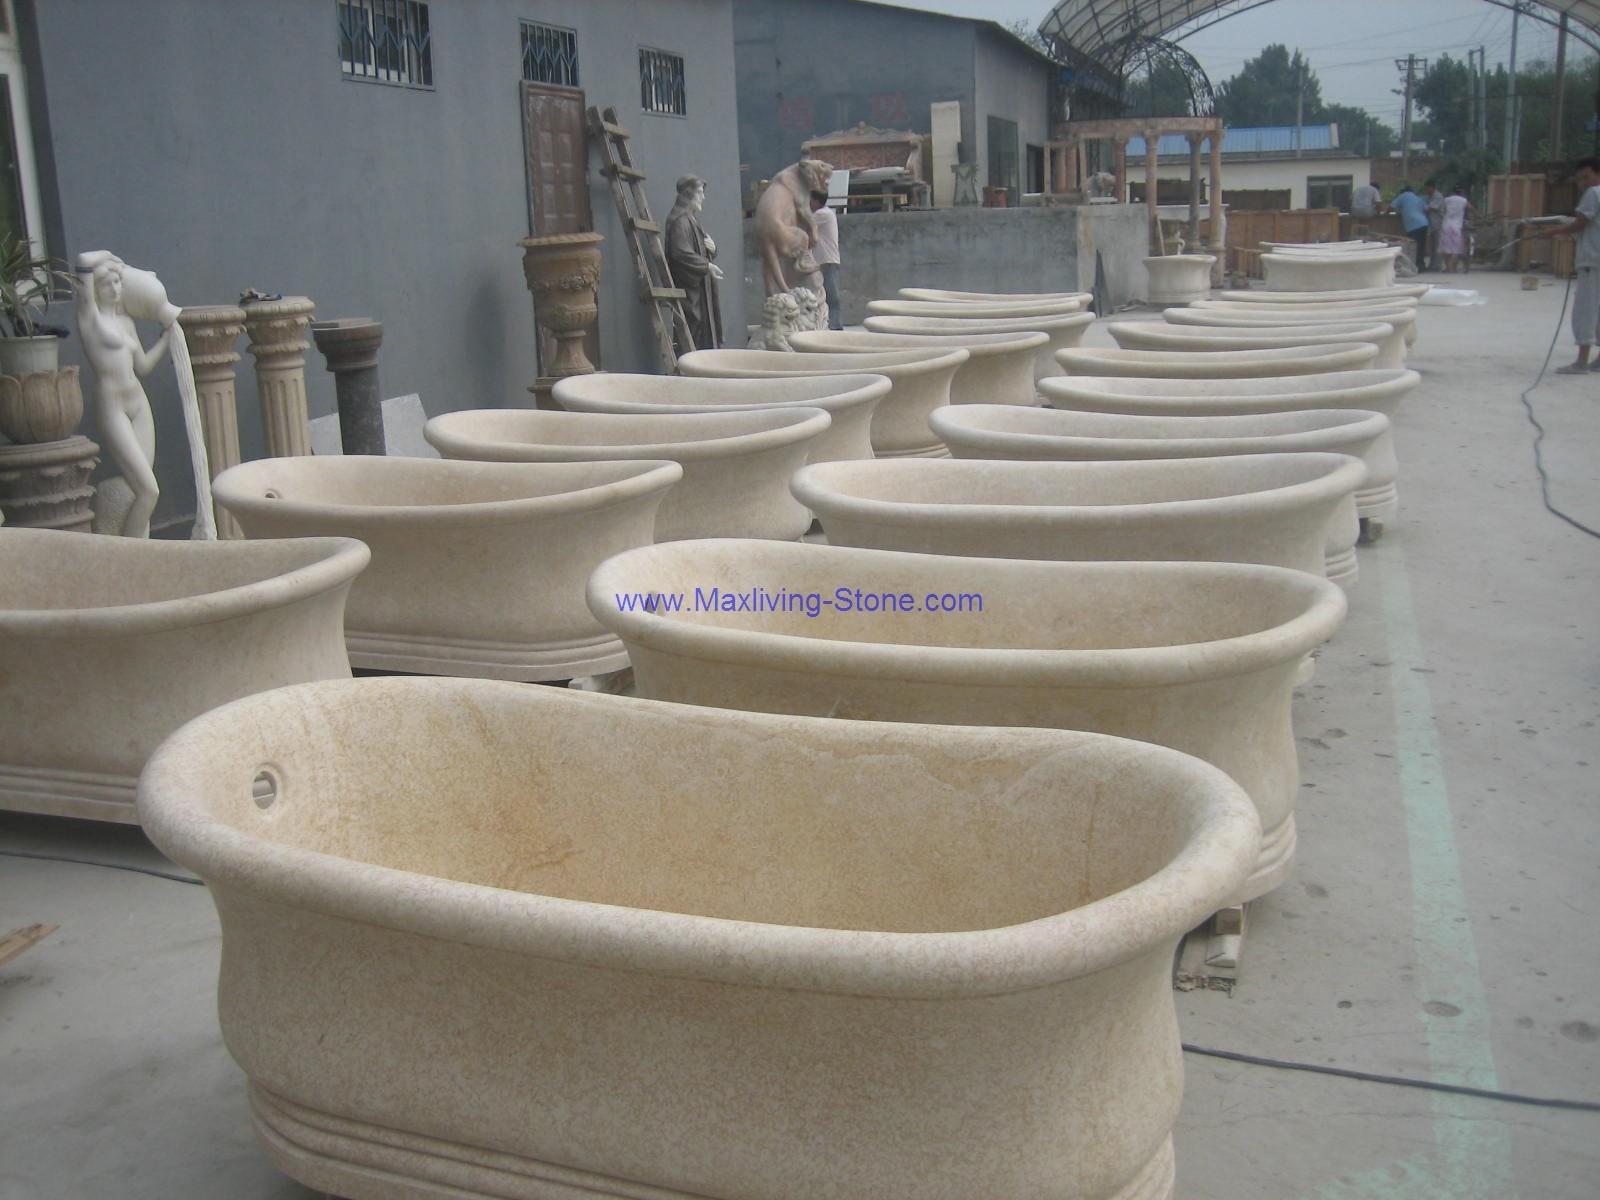 Vasca Da Bagno Marmo : Marmo crema vasca di bagno u marmo crema vasca di bagnofornito